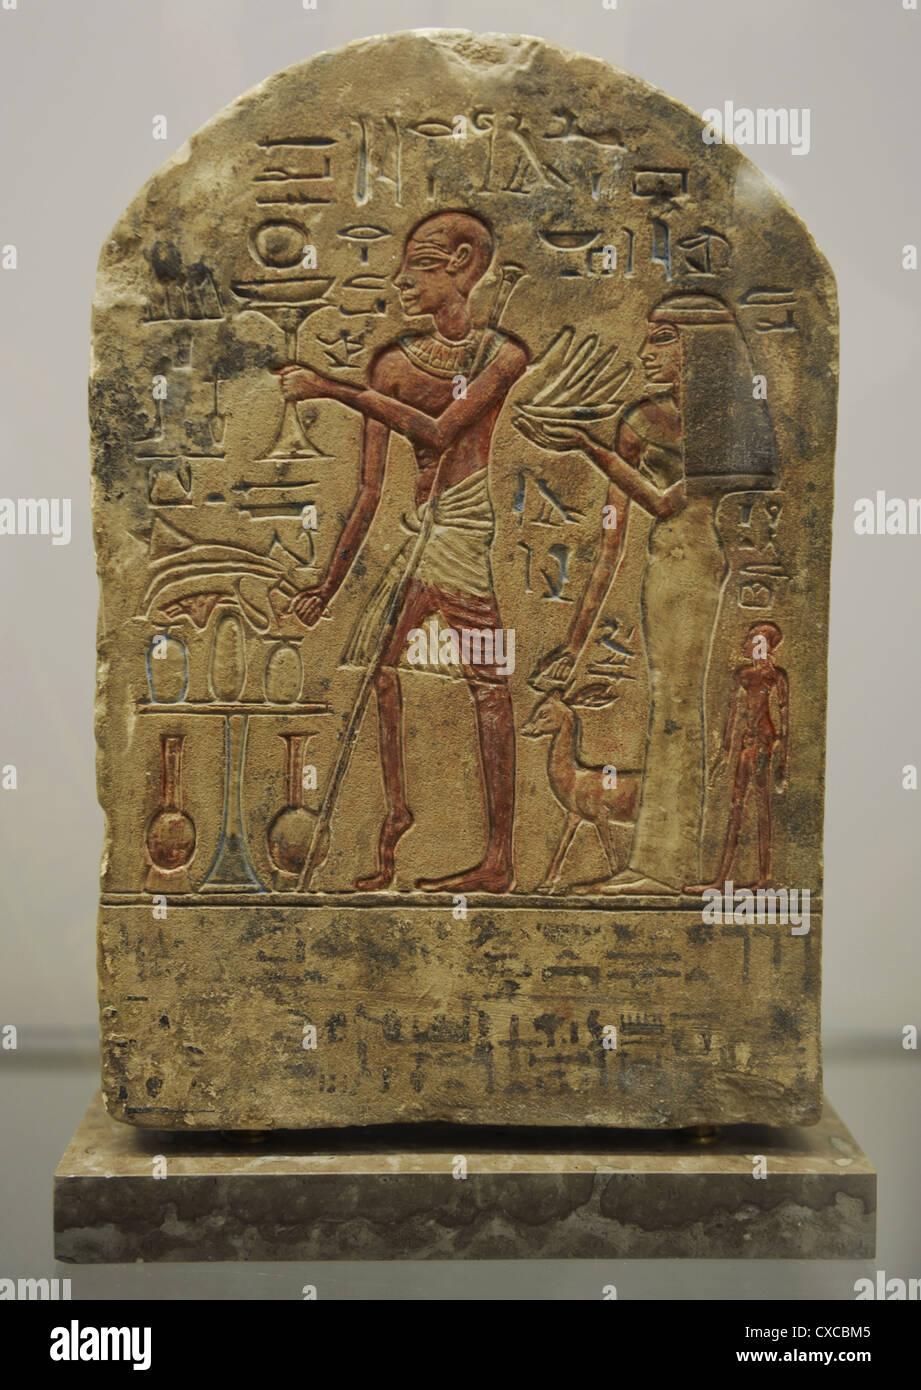 Stele of Roma the doorkeeper dedicated to Goddess Astarte. Limestone. 18th Dynasty. New Kingdom. Origin unknown. - Stock Image